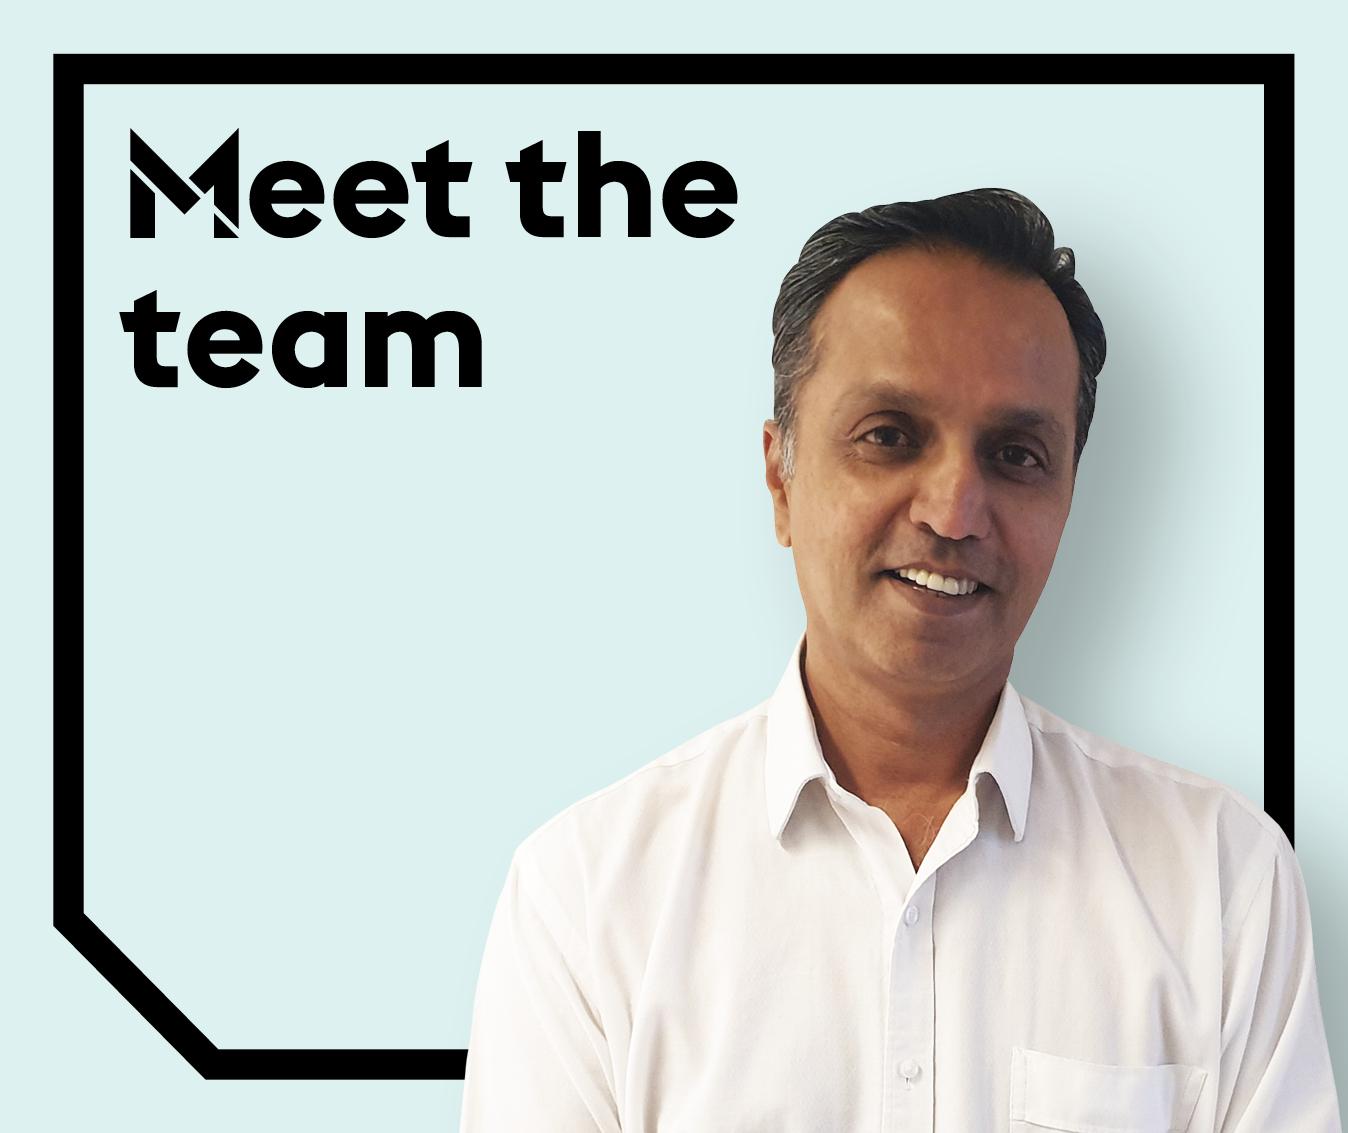 Meet The Team - Chetan Bhatt